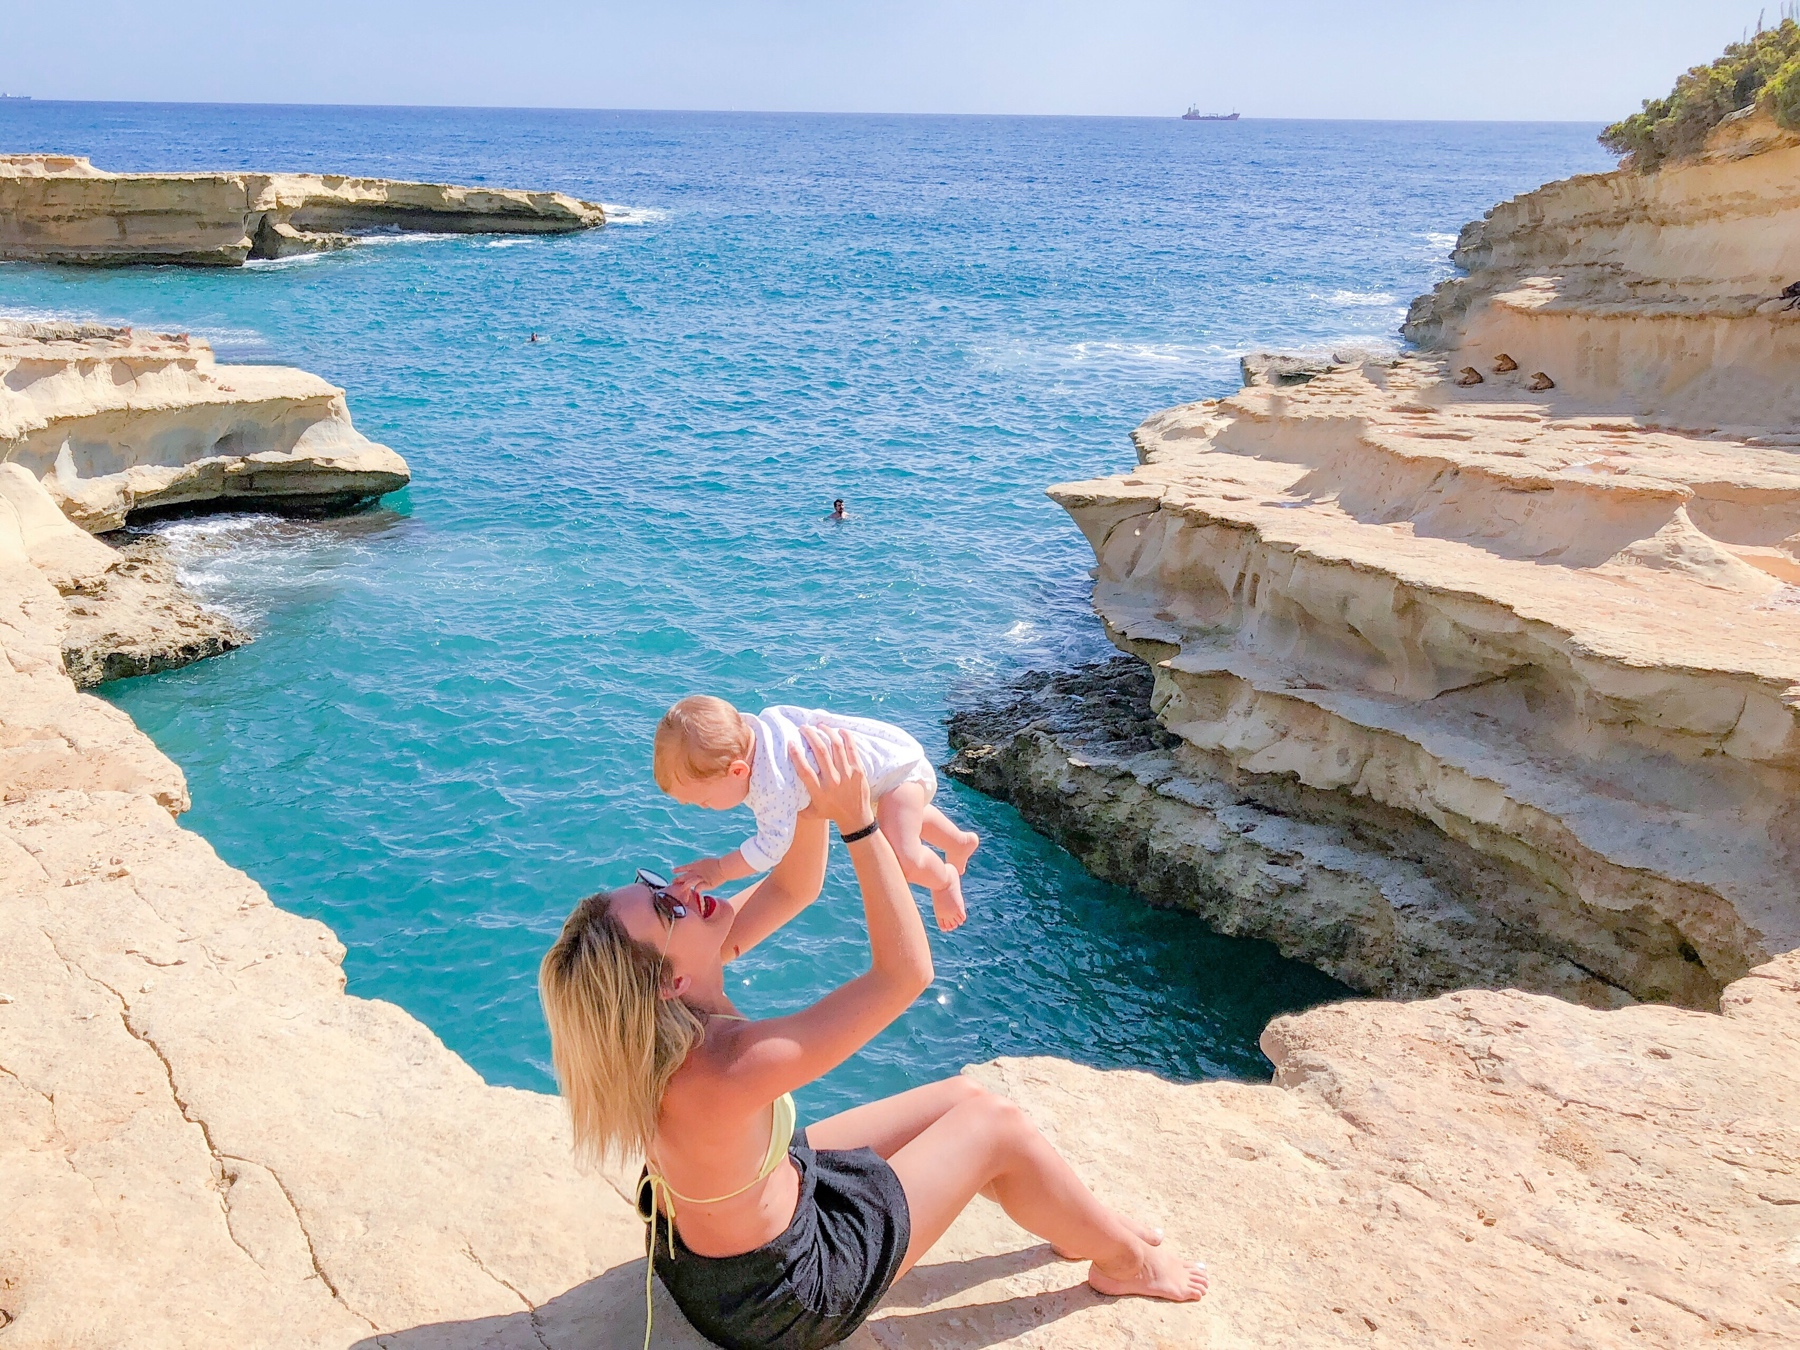 St Peter's Pool Malta - toque fazer em Malta